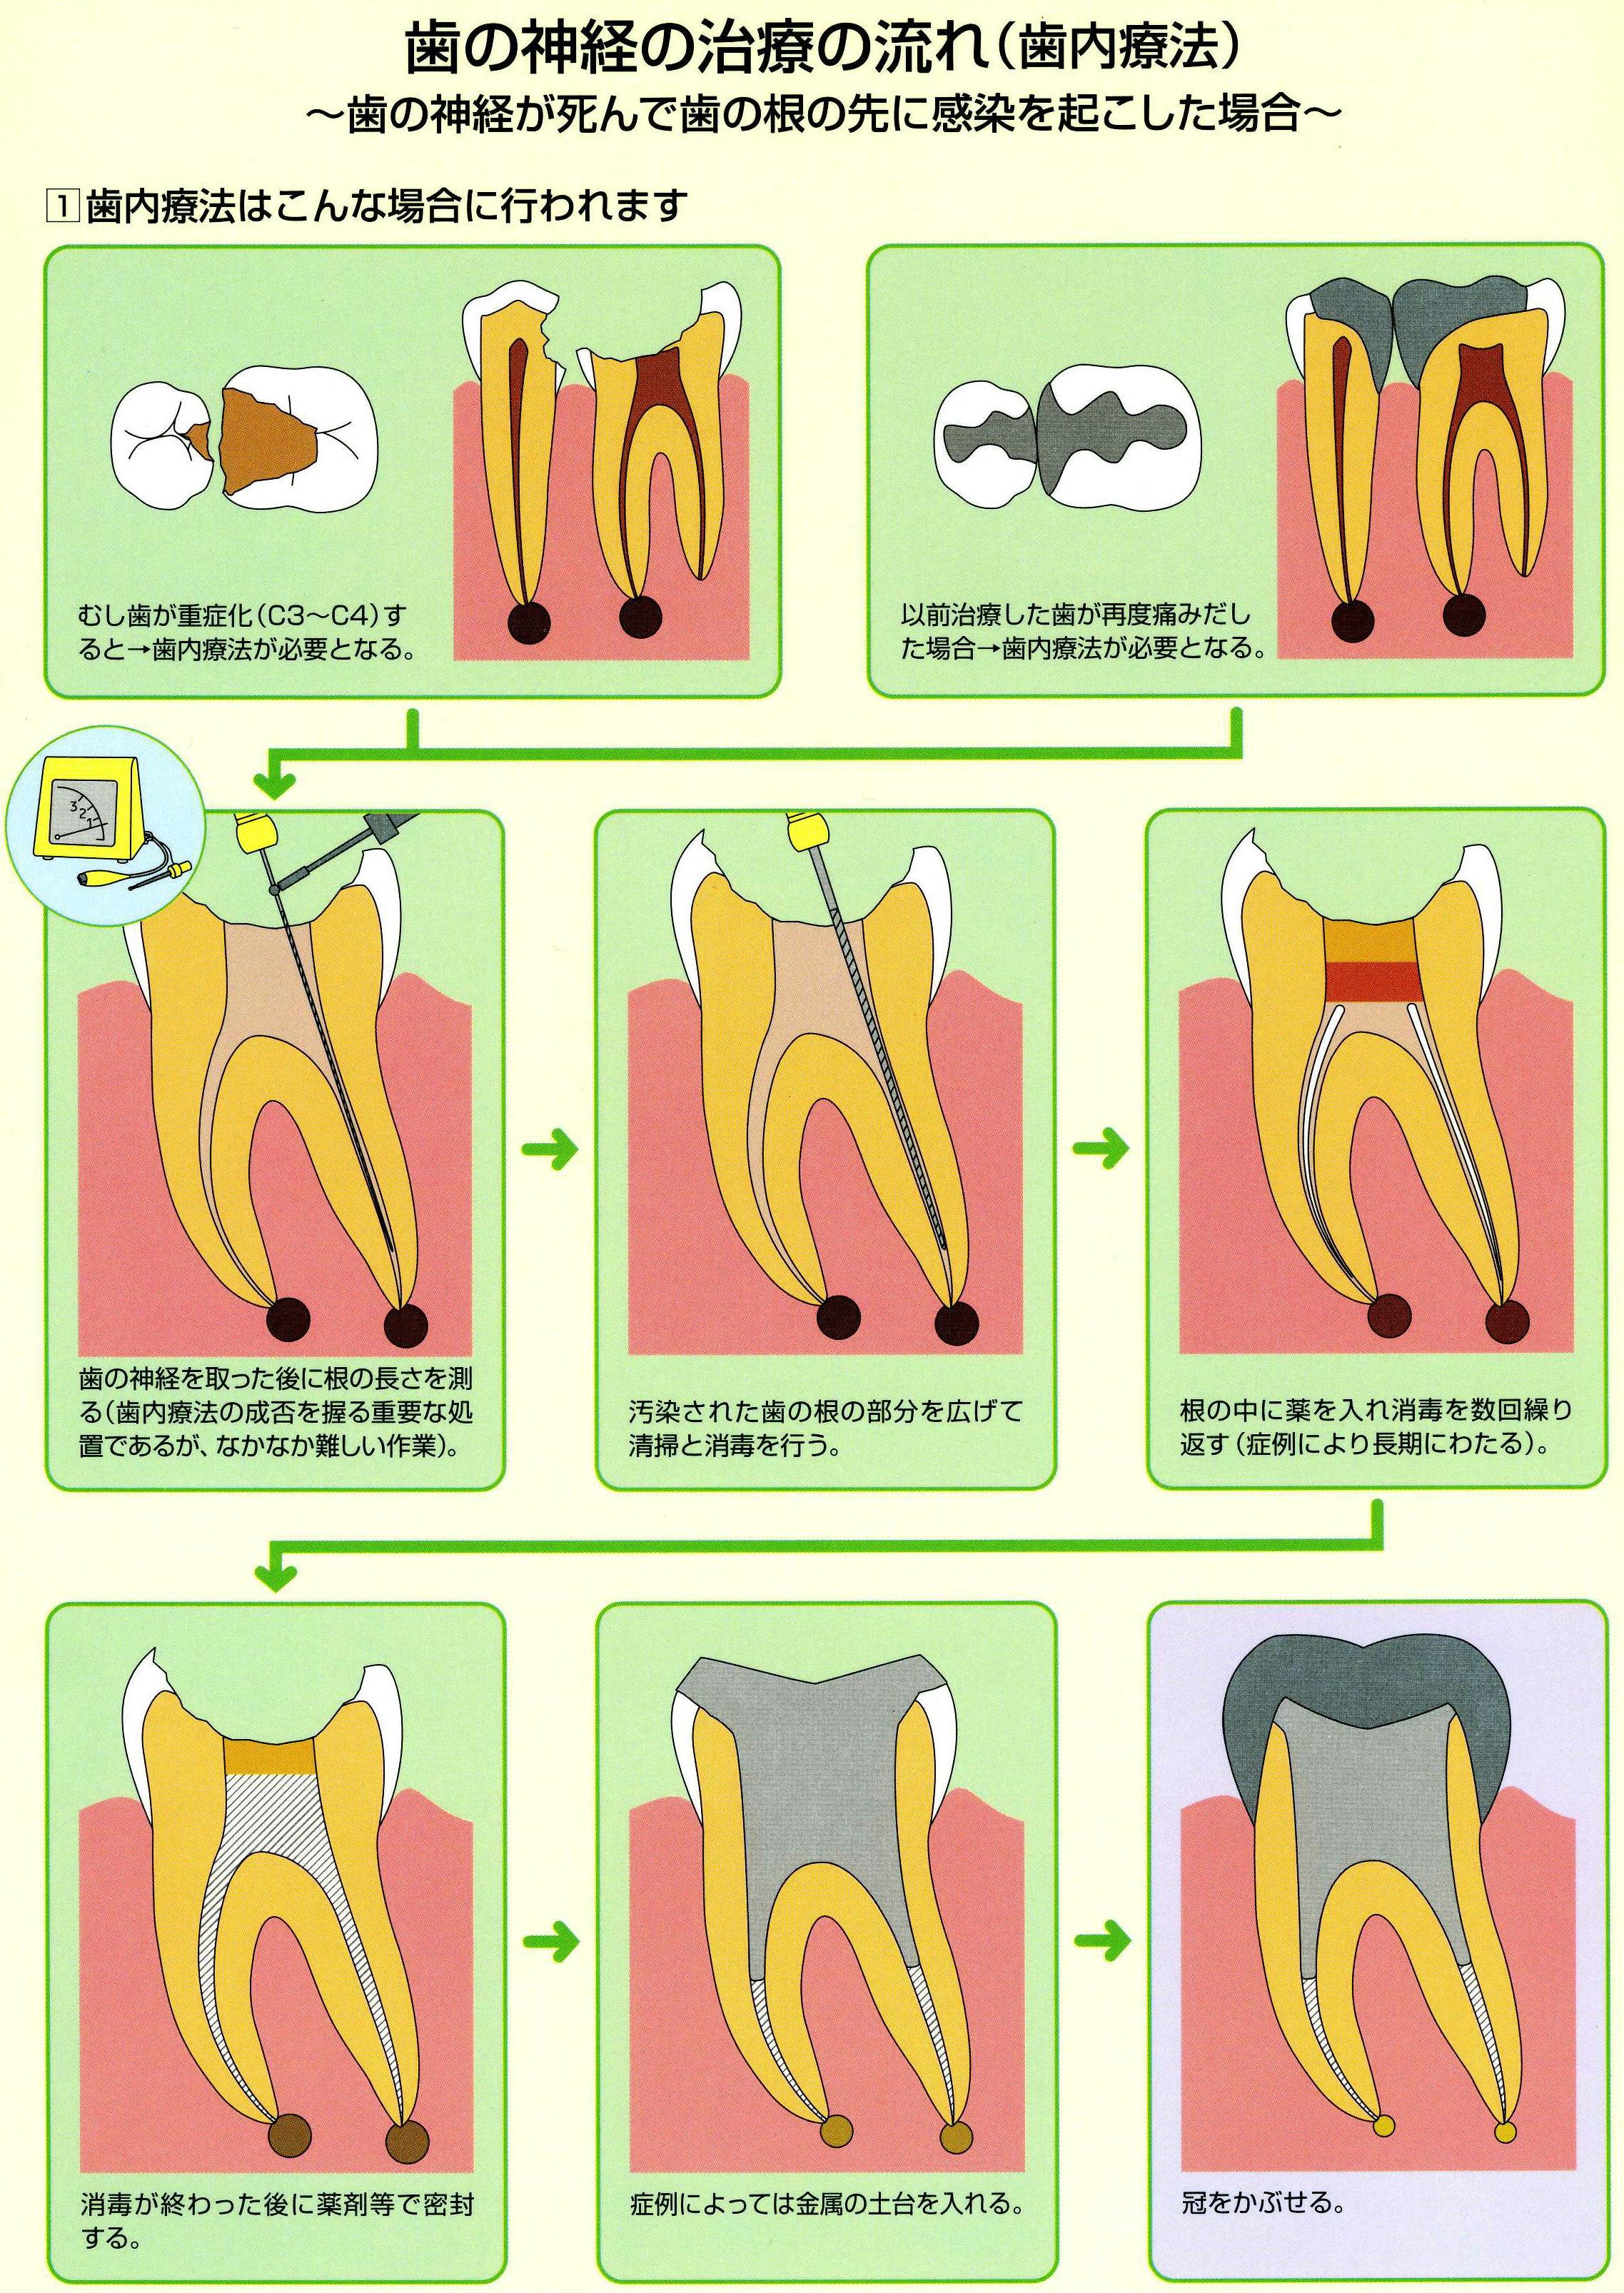 診療案内|Yamazaki Dental Clinic